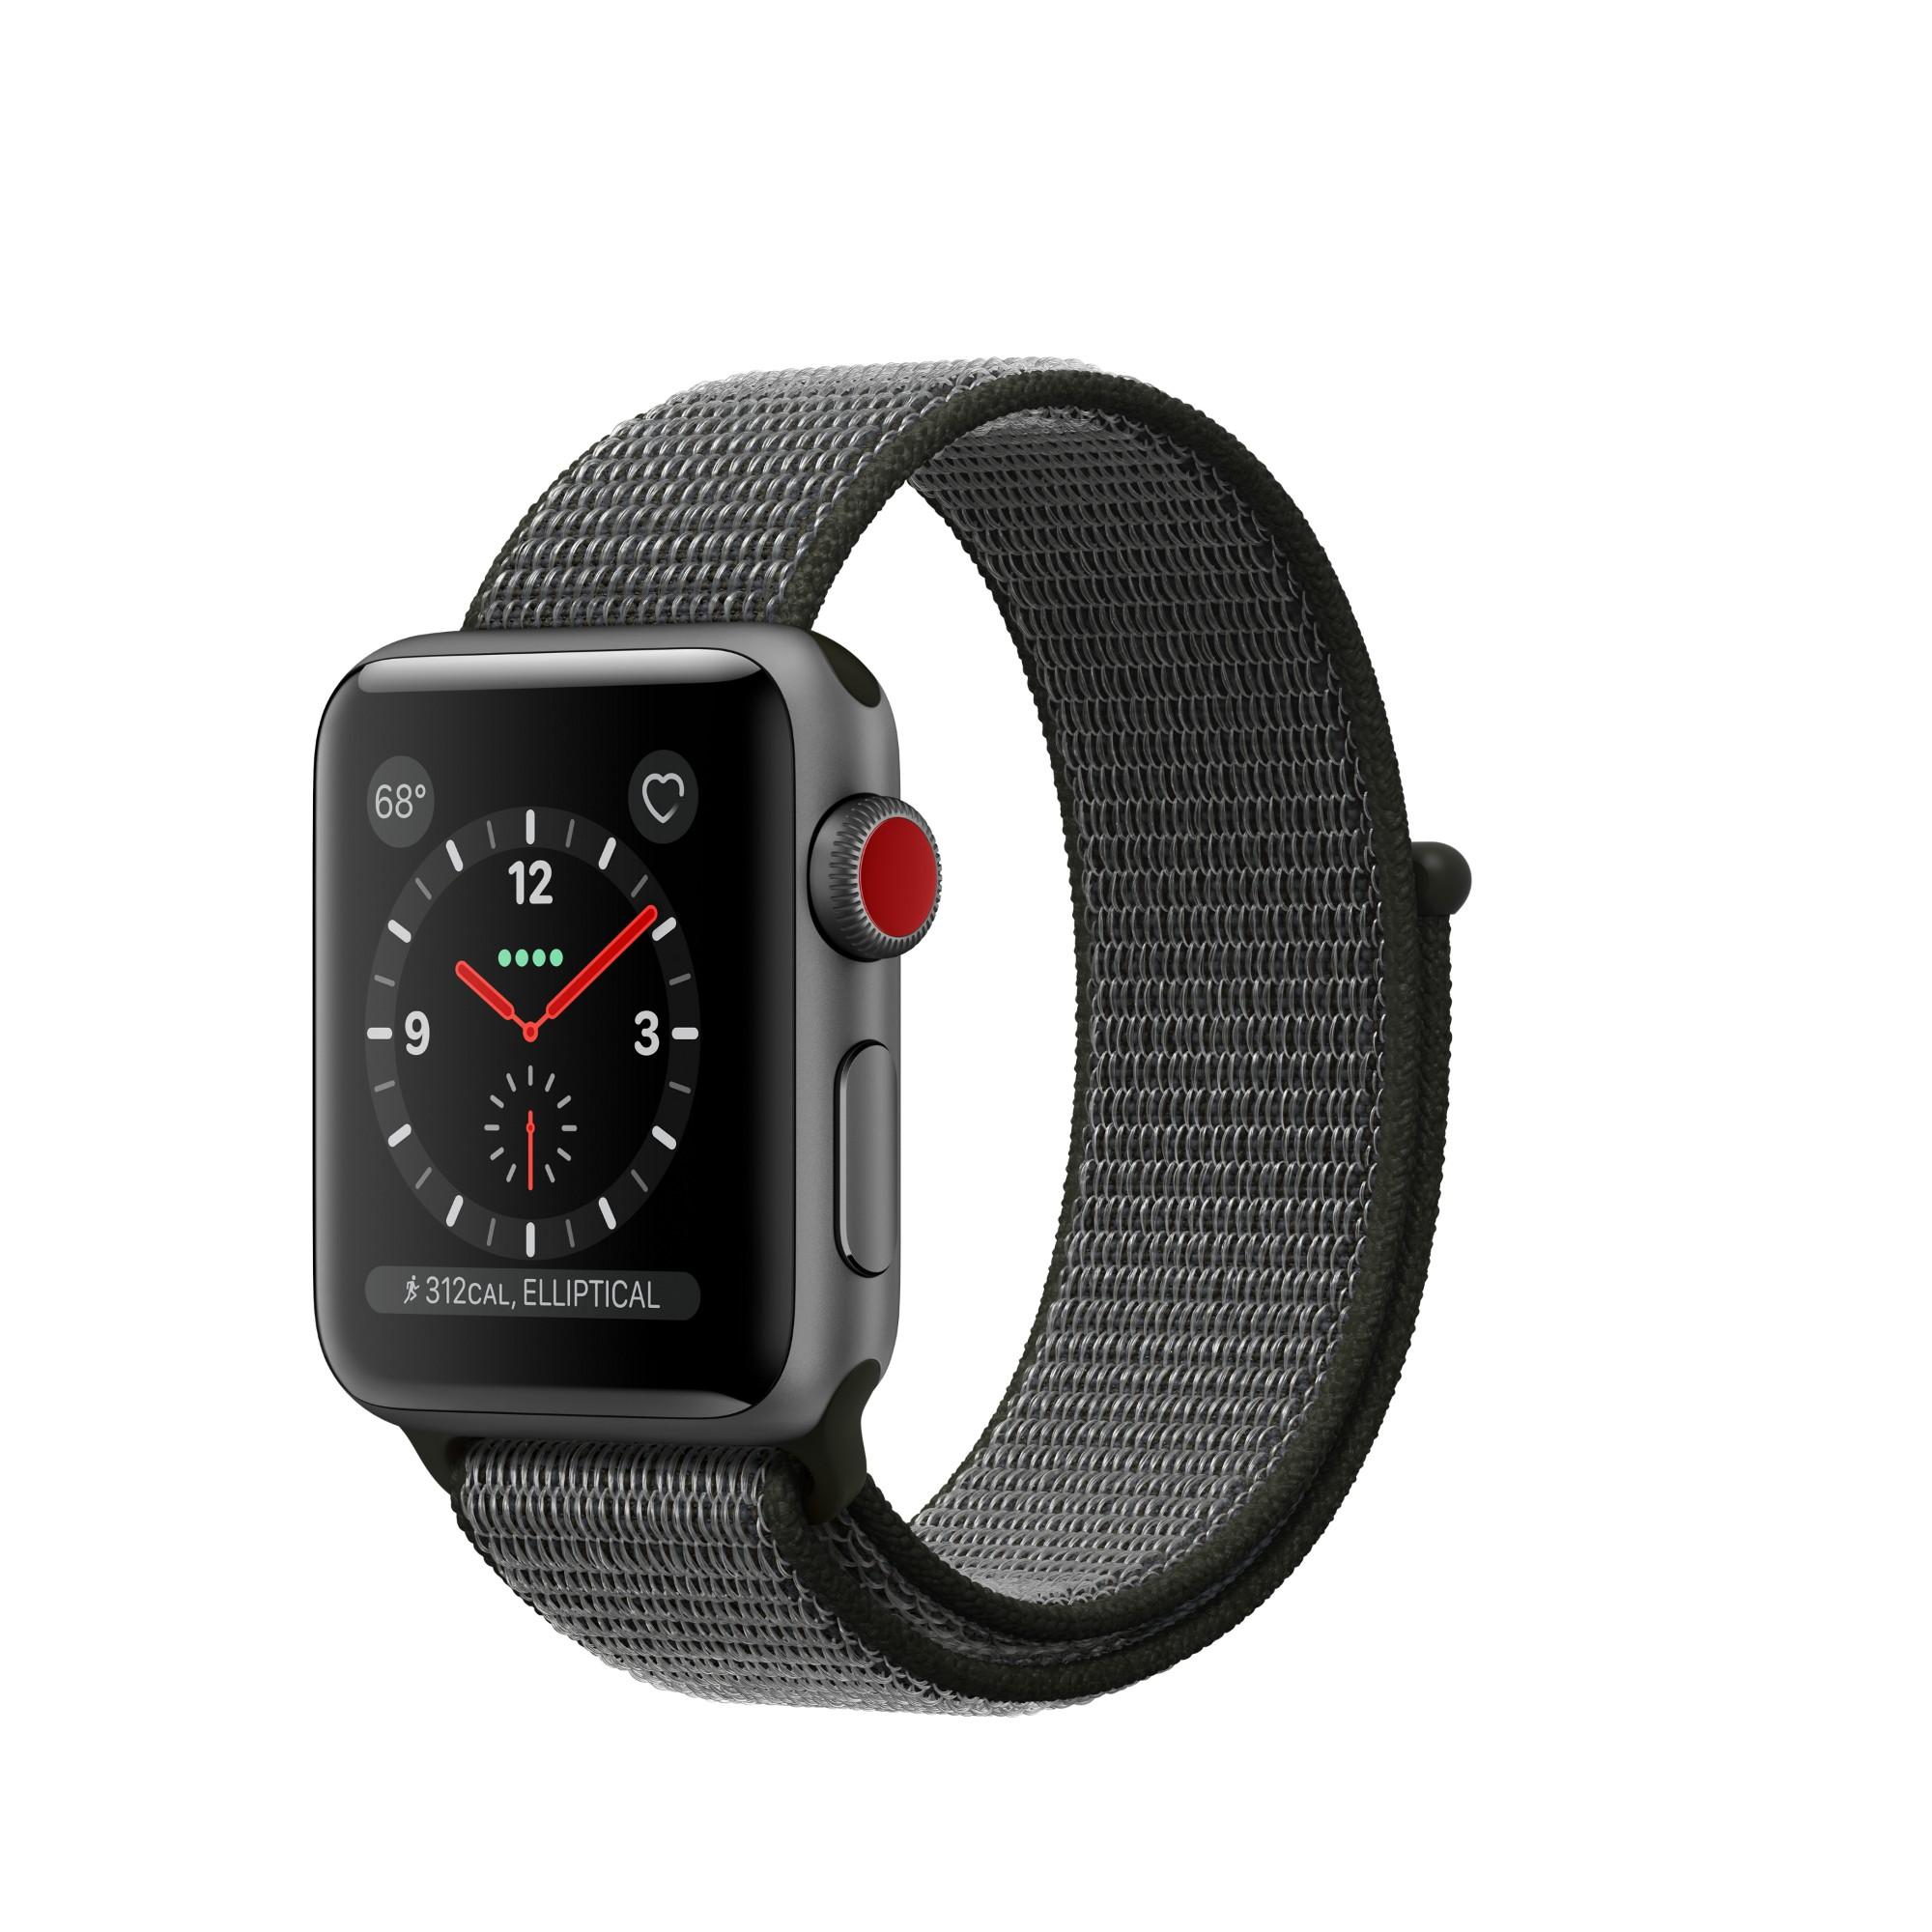 72031d73b1436 Apple Watch Series 3 smartwatch Grey OLED Cellular GPS (satellite) -  MQKK2B A